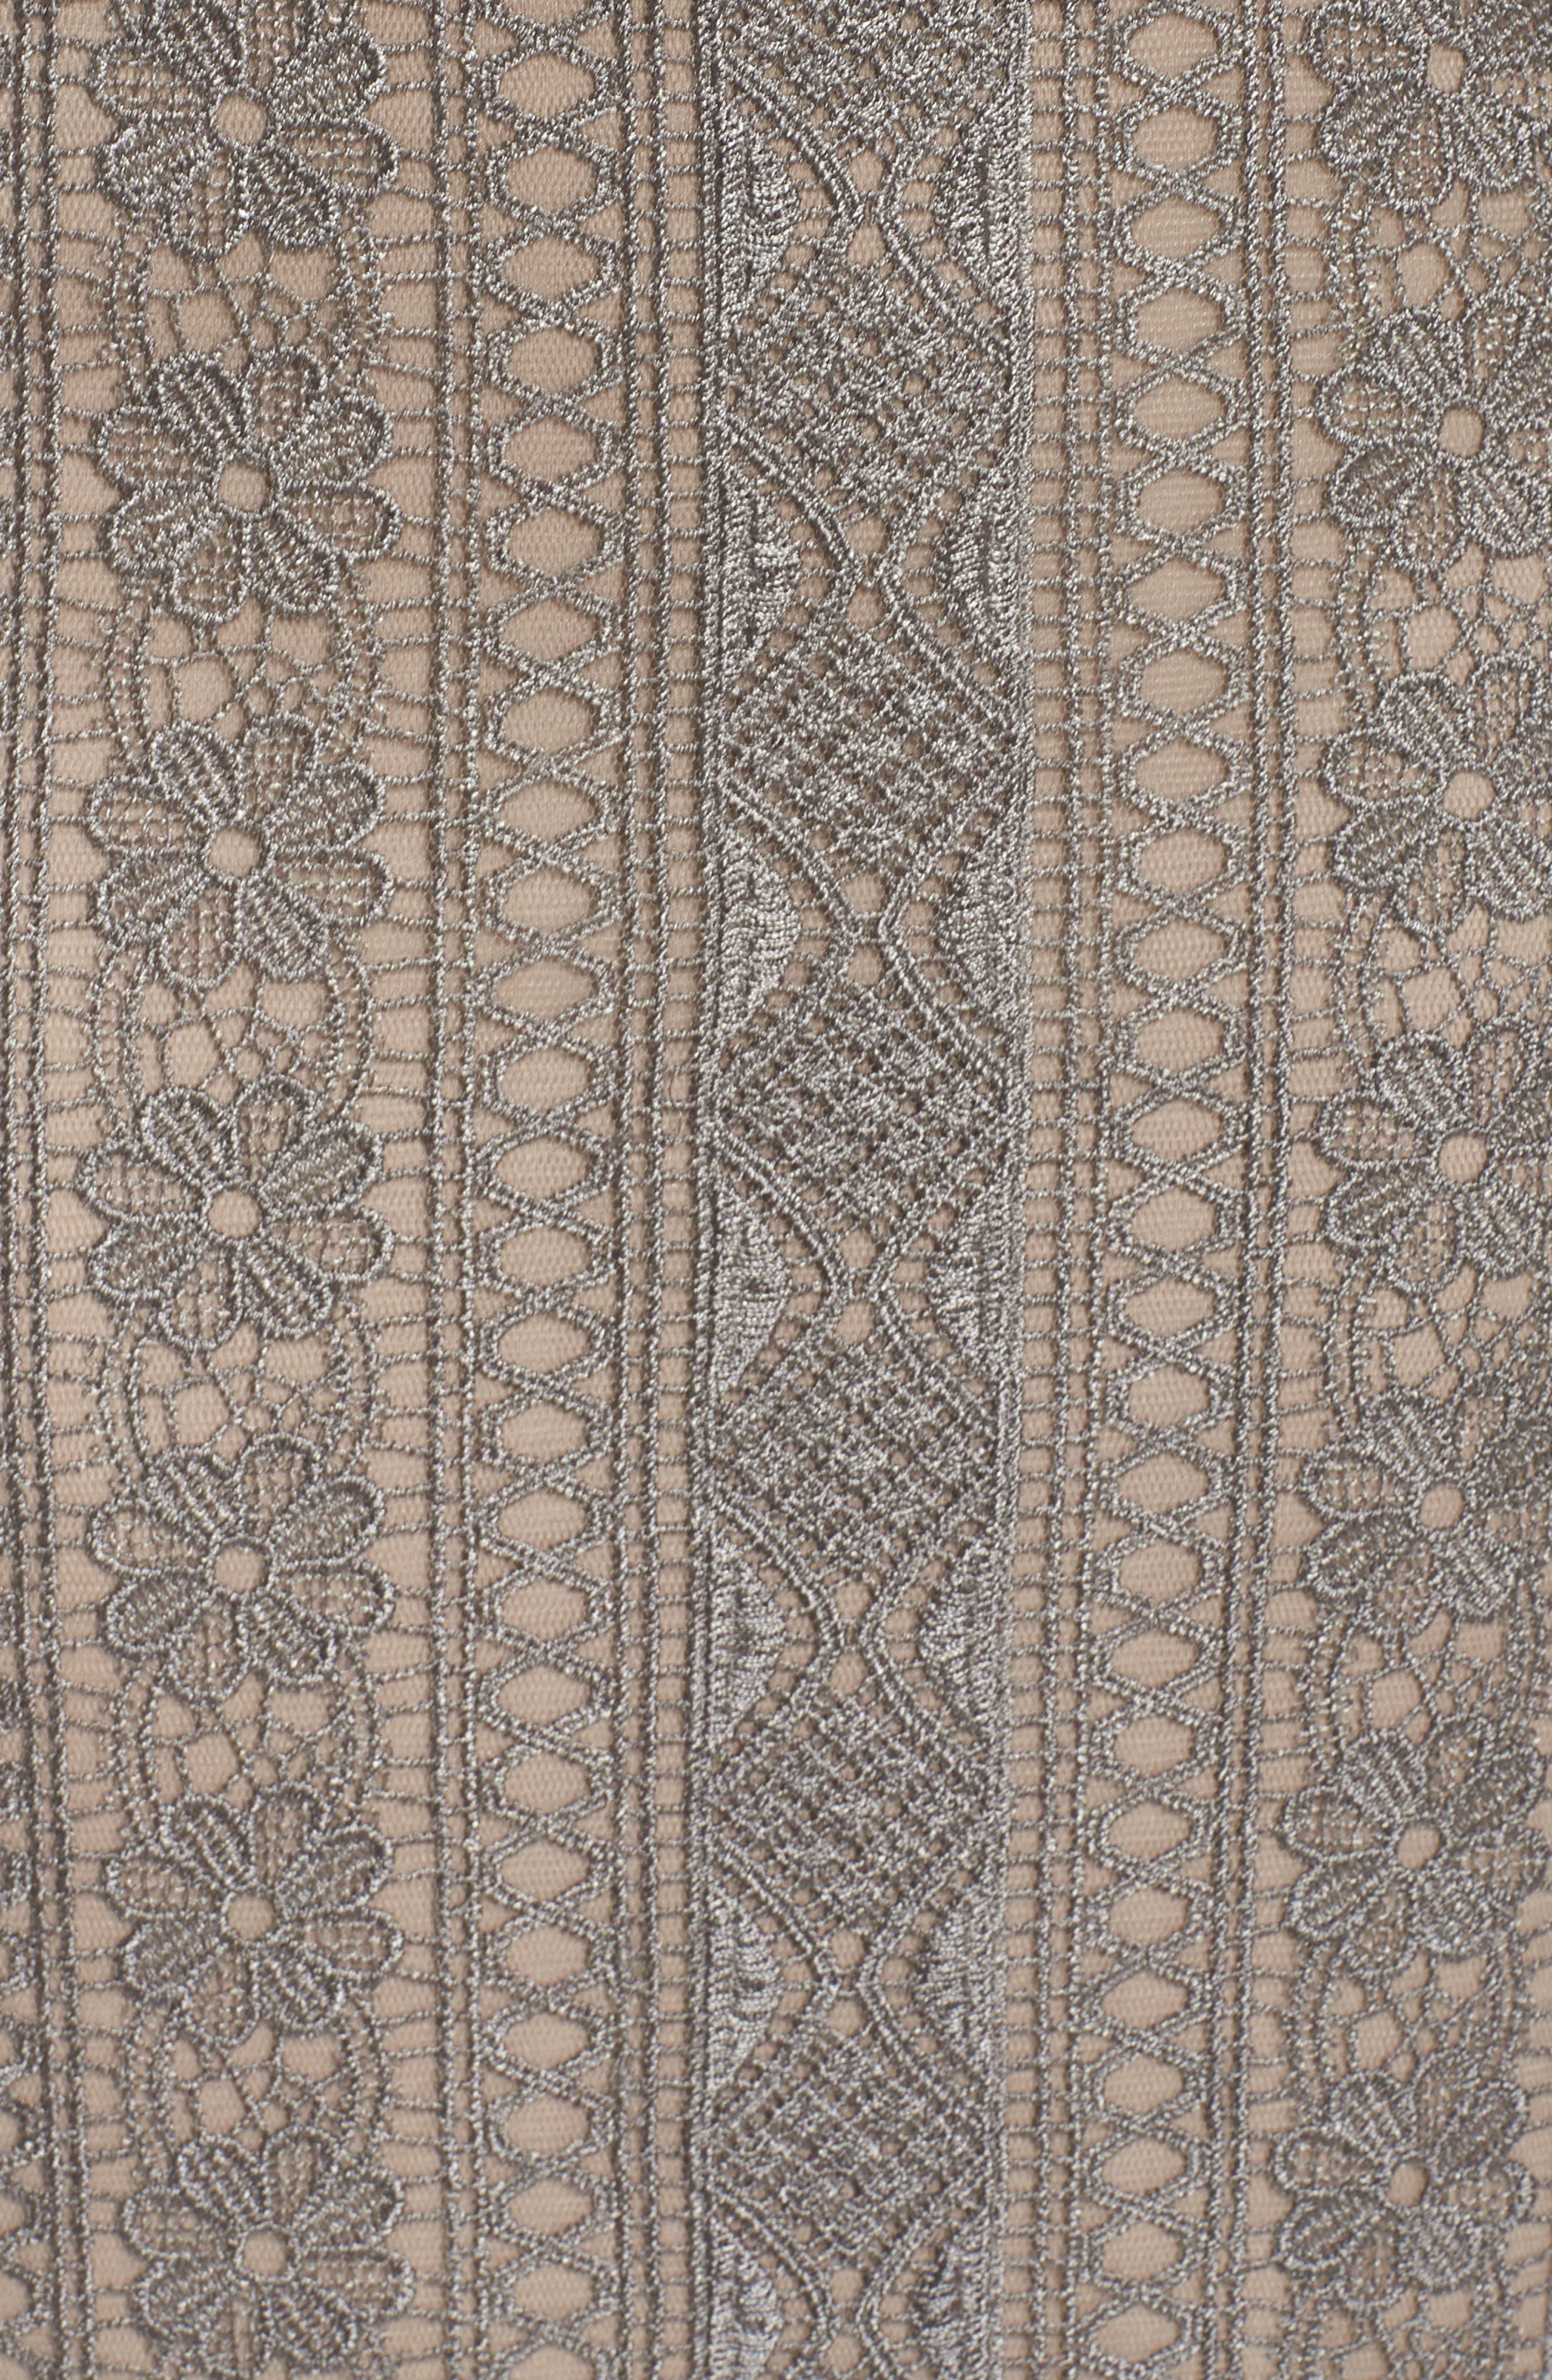 Lace Gown,                             Alternate thumbnail 6, color,                             LATTE/ SMOKE